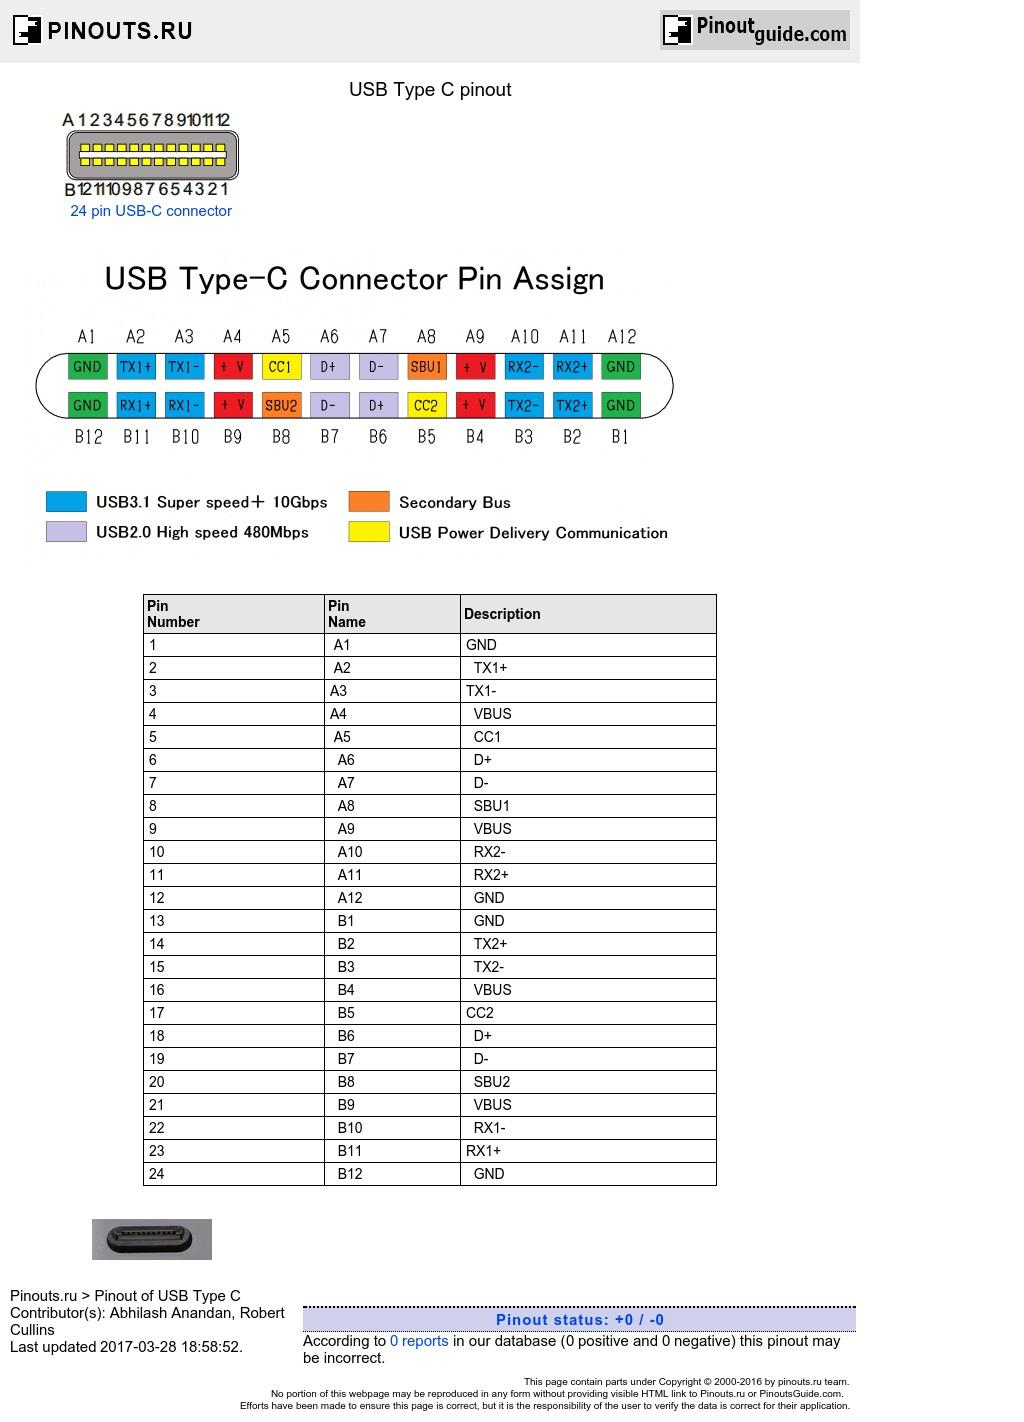 Usb Type C Pinout Diagram @ Pinoutguide - Usb Wiring Diagram